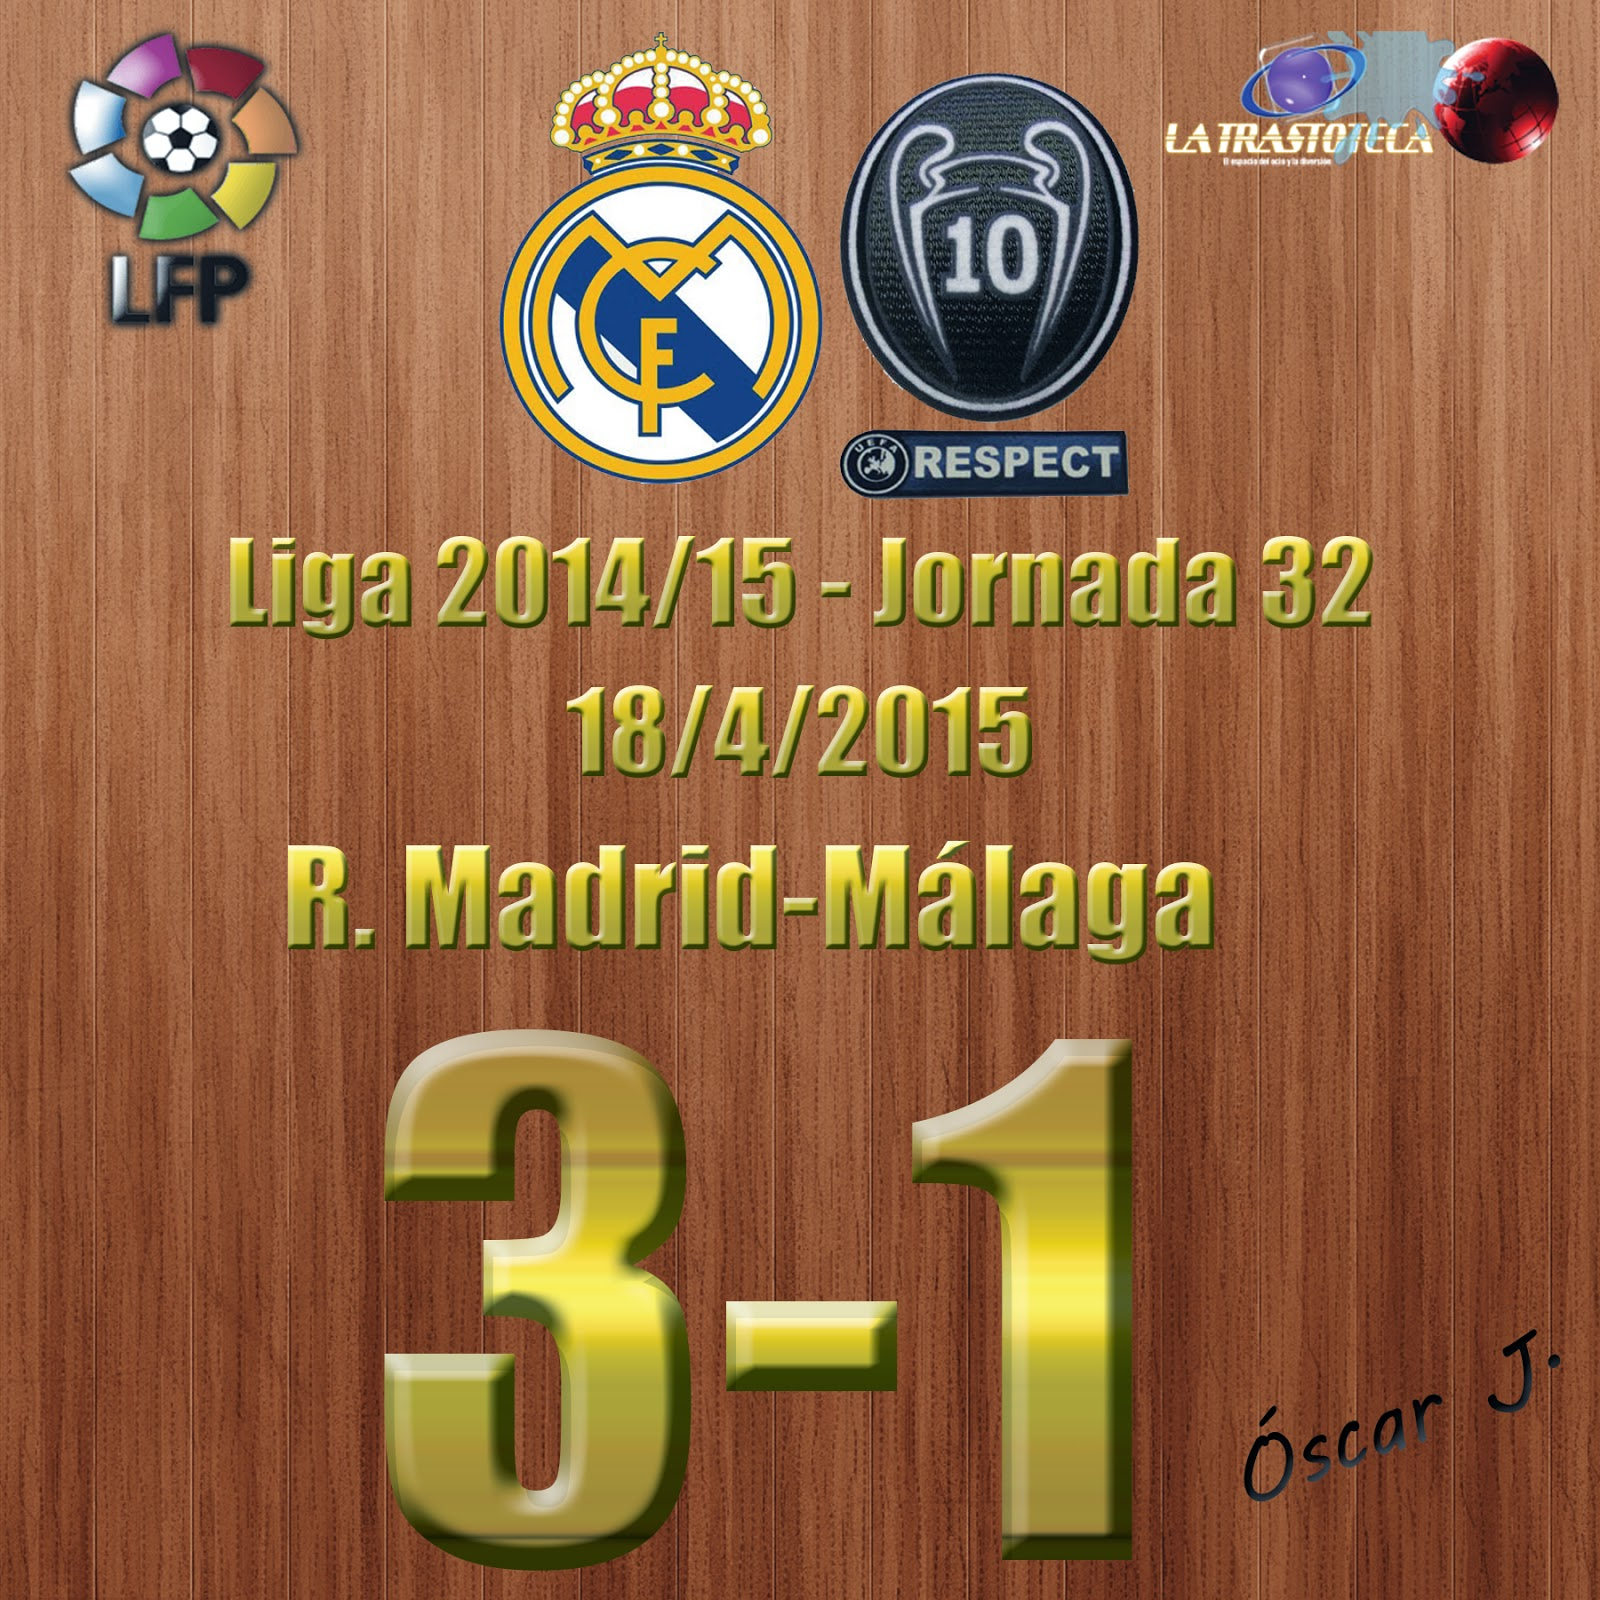 Real Madrid 3-1 Málaga - Liga 2014/15 - Jornada 32 - (18/4/2015)